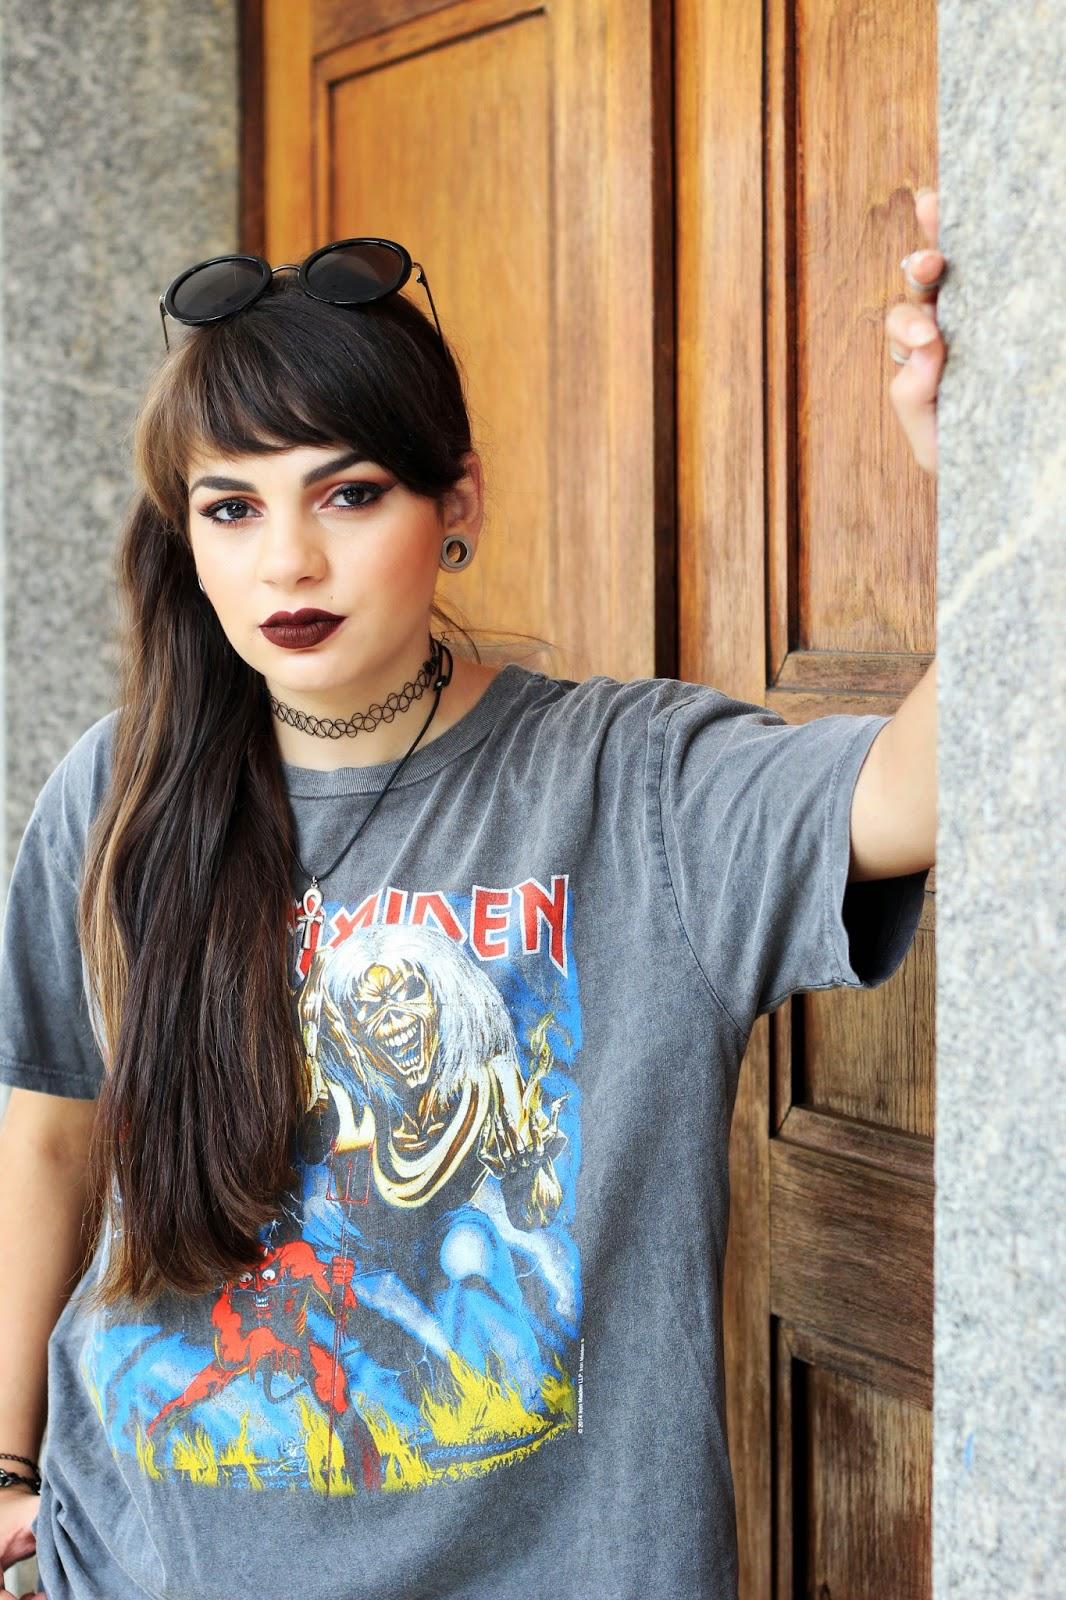 104405cfa T-shirt: Topshop / Calça: Forever 21 / Bolsa: ZARA / Creeper: Asos /  Óculos: Dafiti